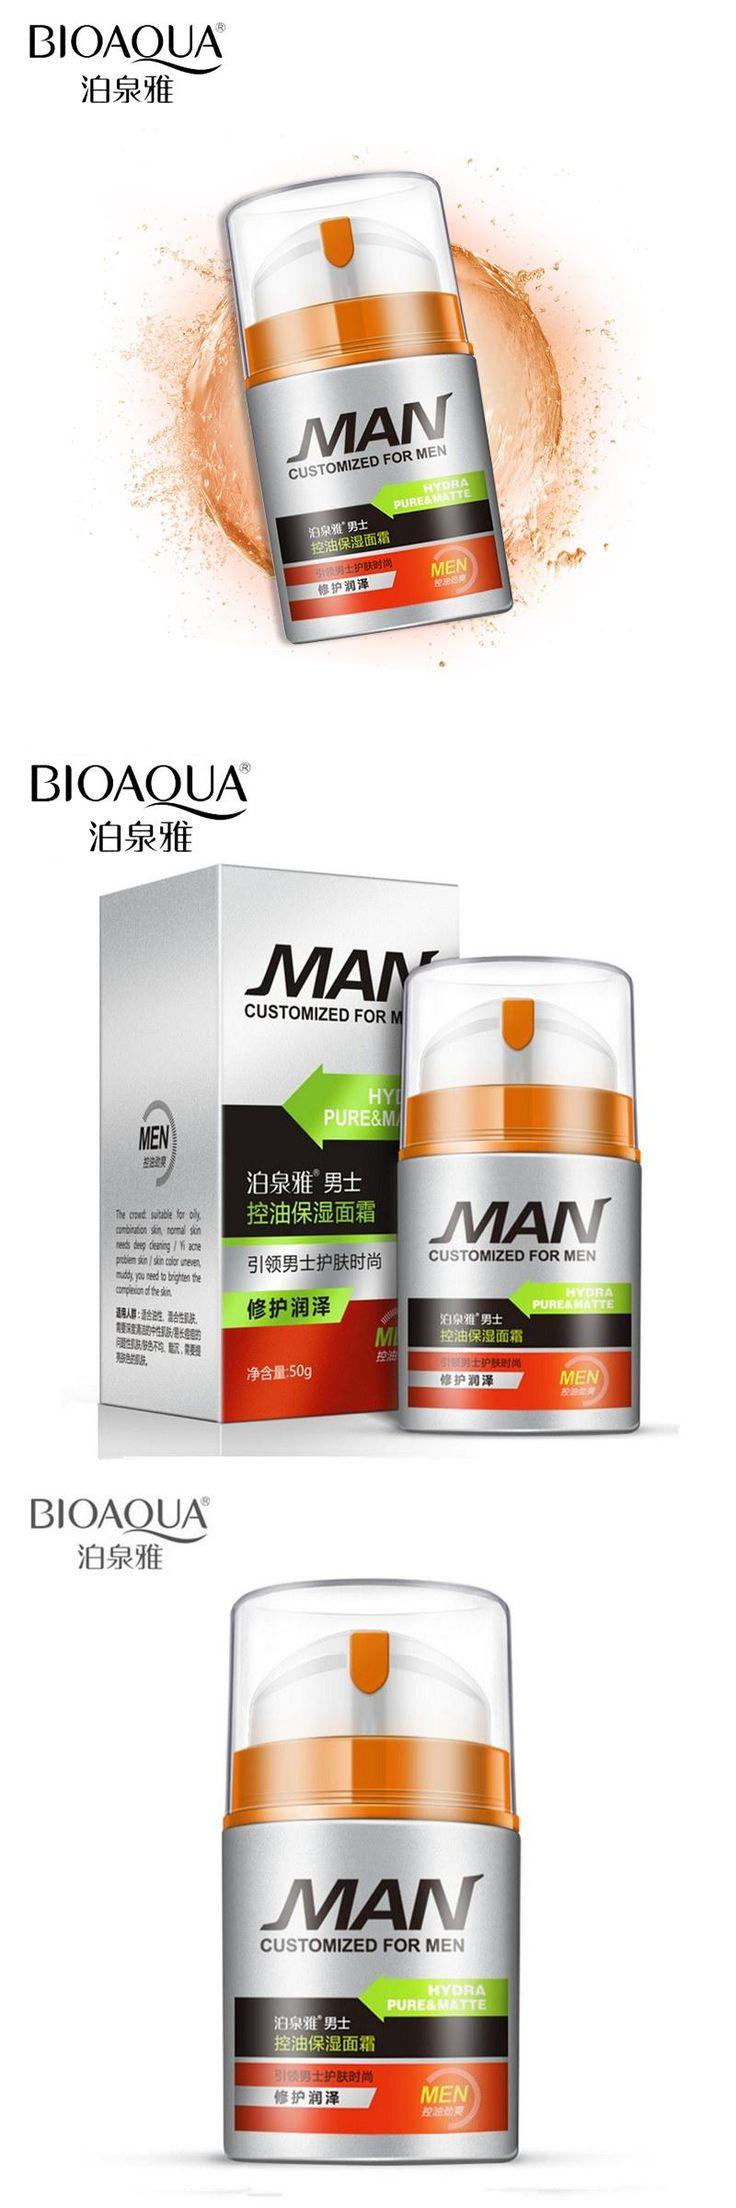 [Visit to Buy] BIOAQUA Brand Men Skin Care Deep Hydrating Moisturizing Oil-control Whitening Face Cream Anti Wrinkle Anti-Aging Day Cream 50g #Advertisement